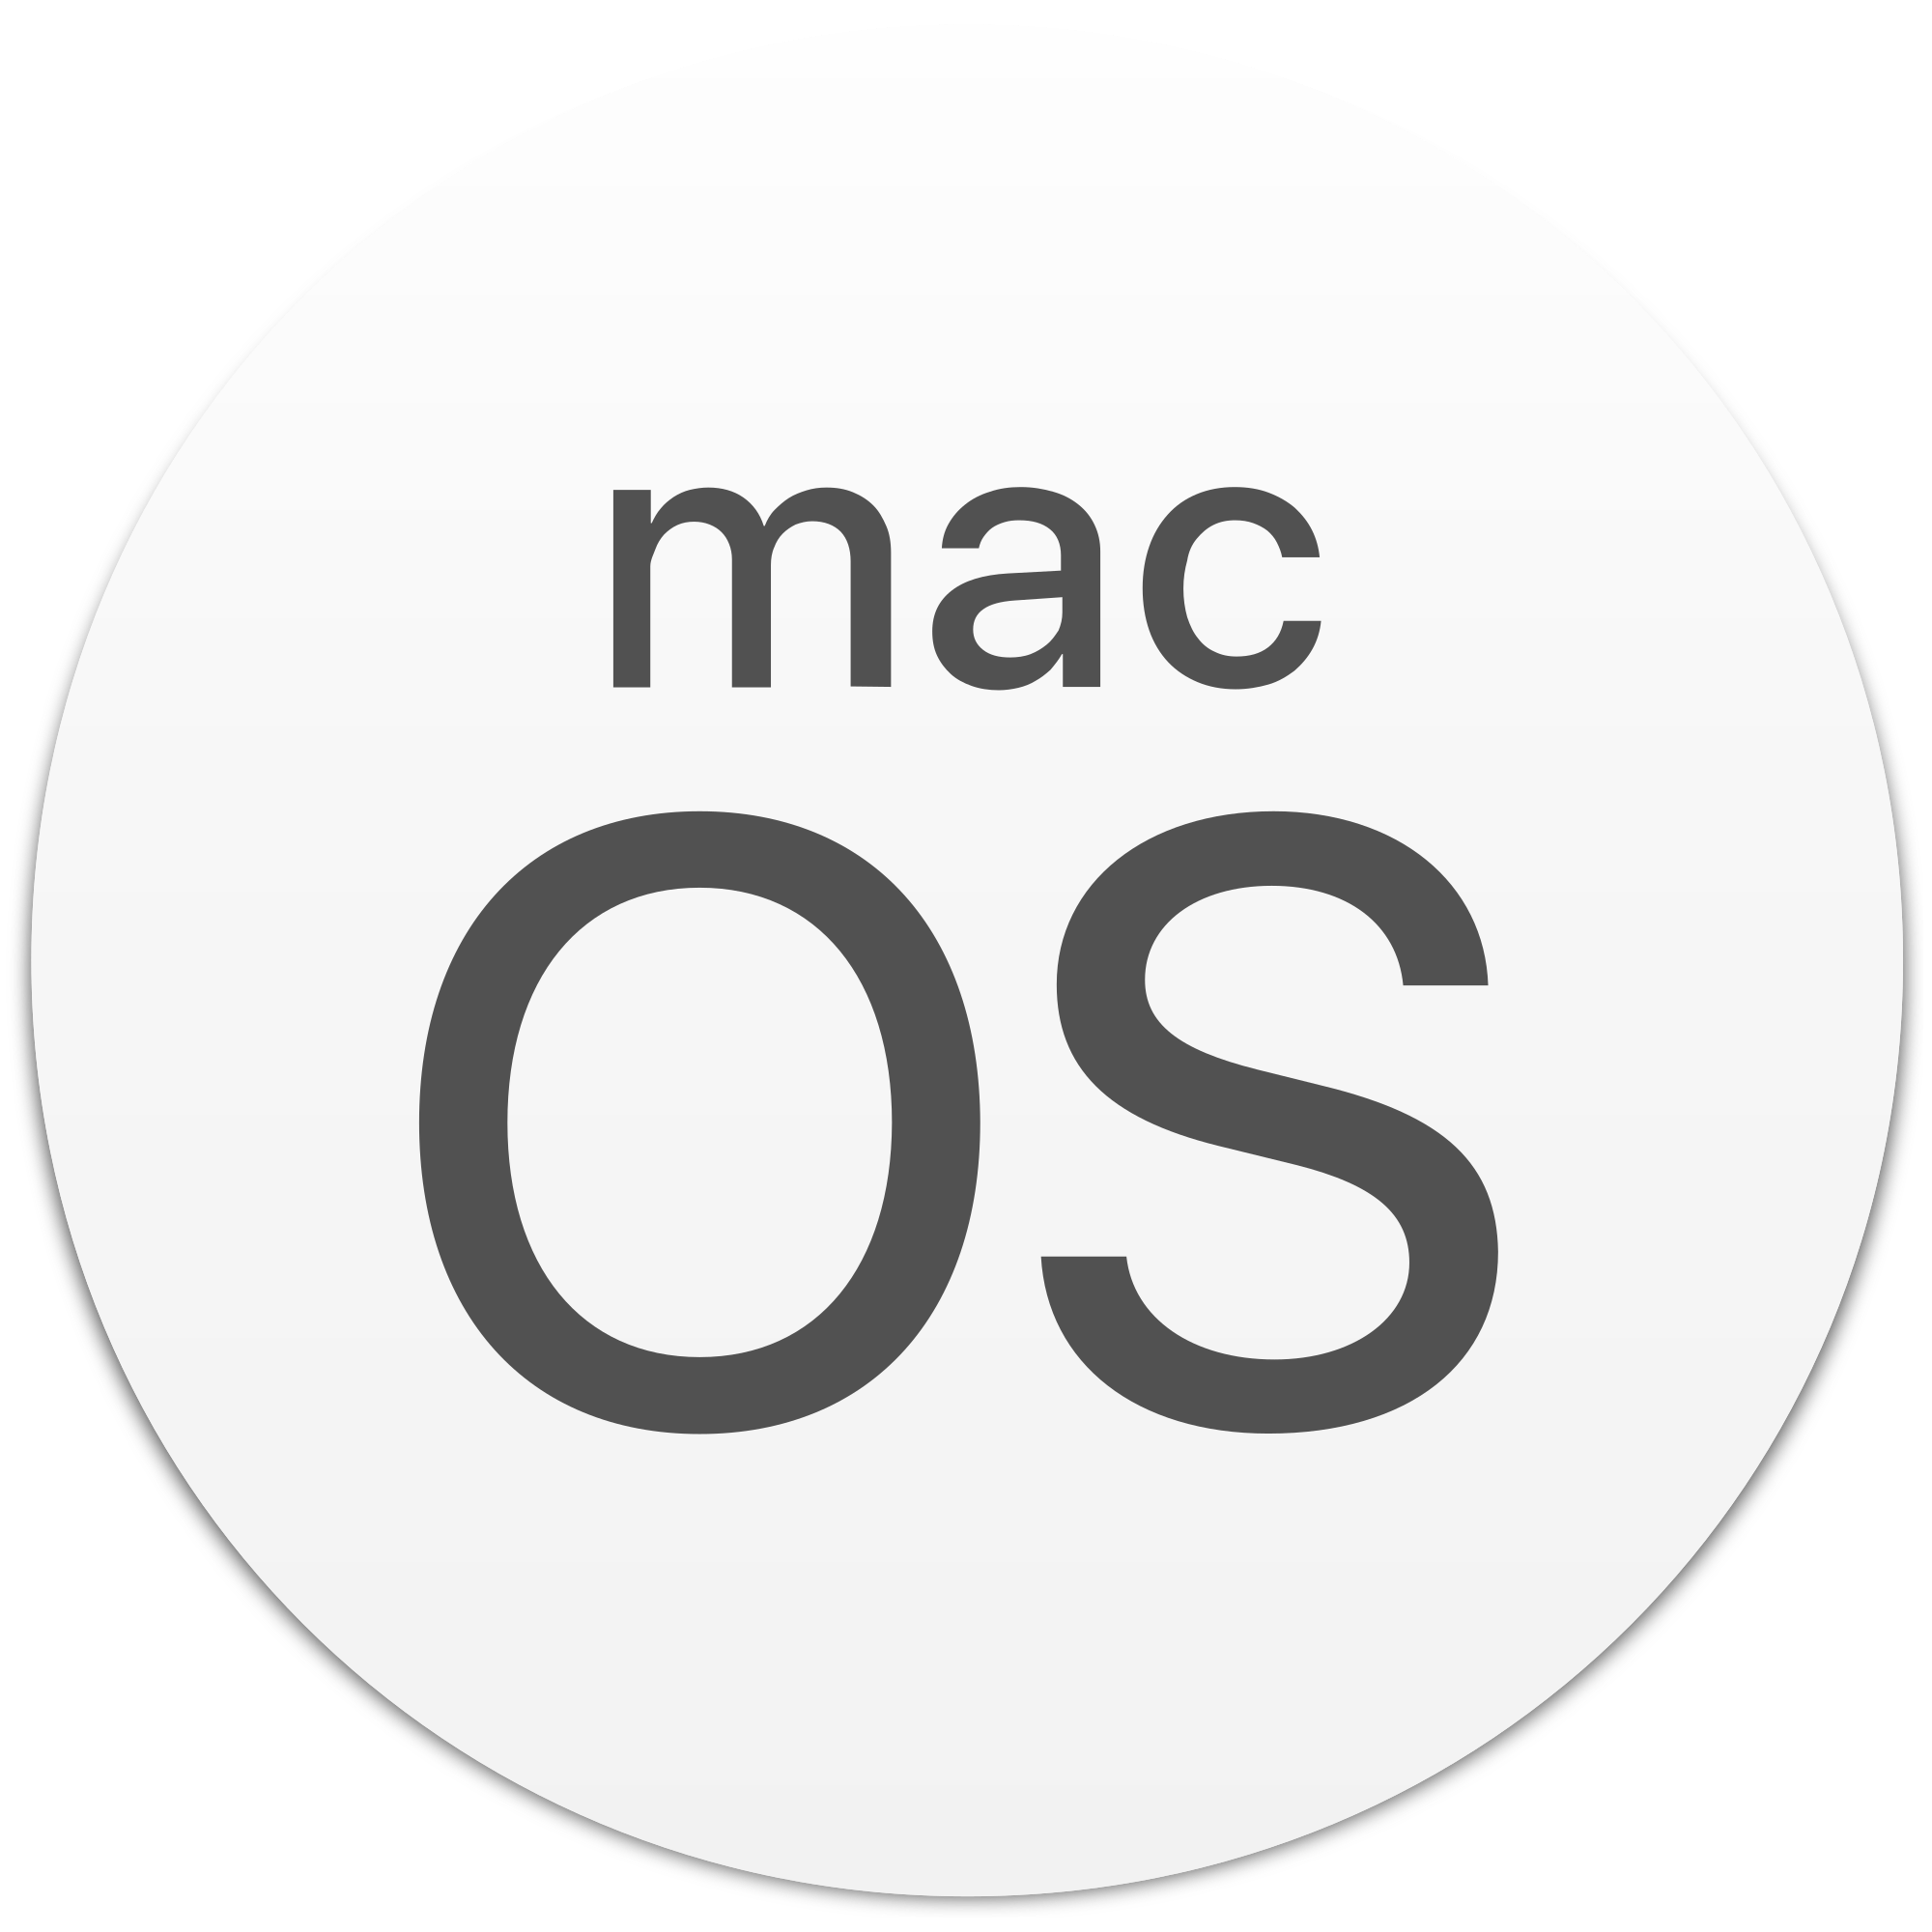 File:macOS logo.png.